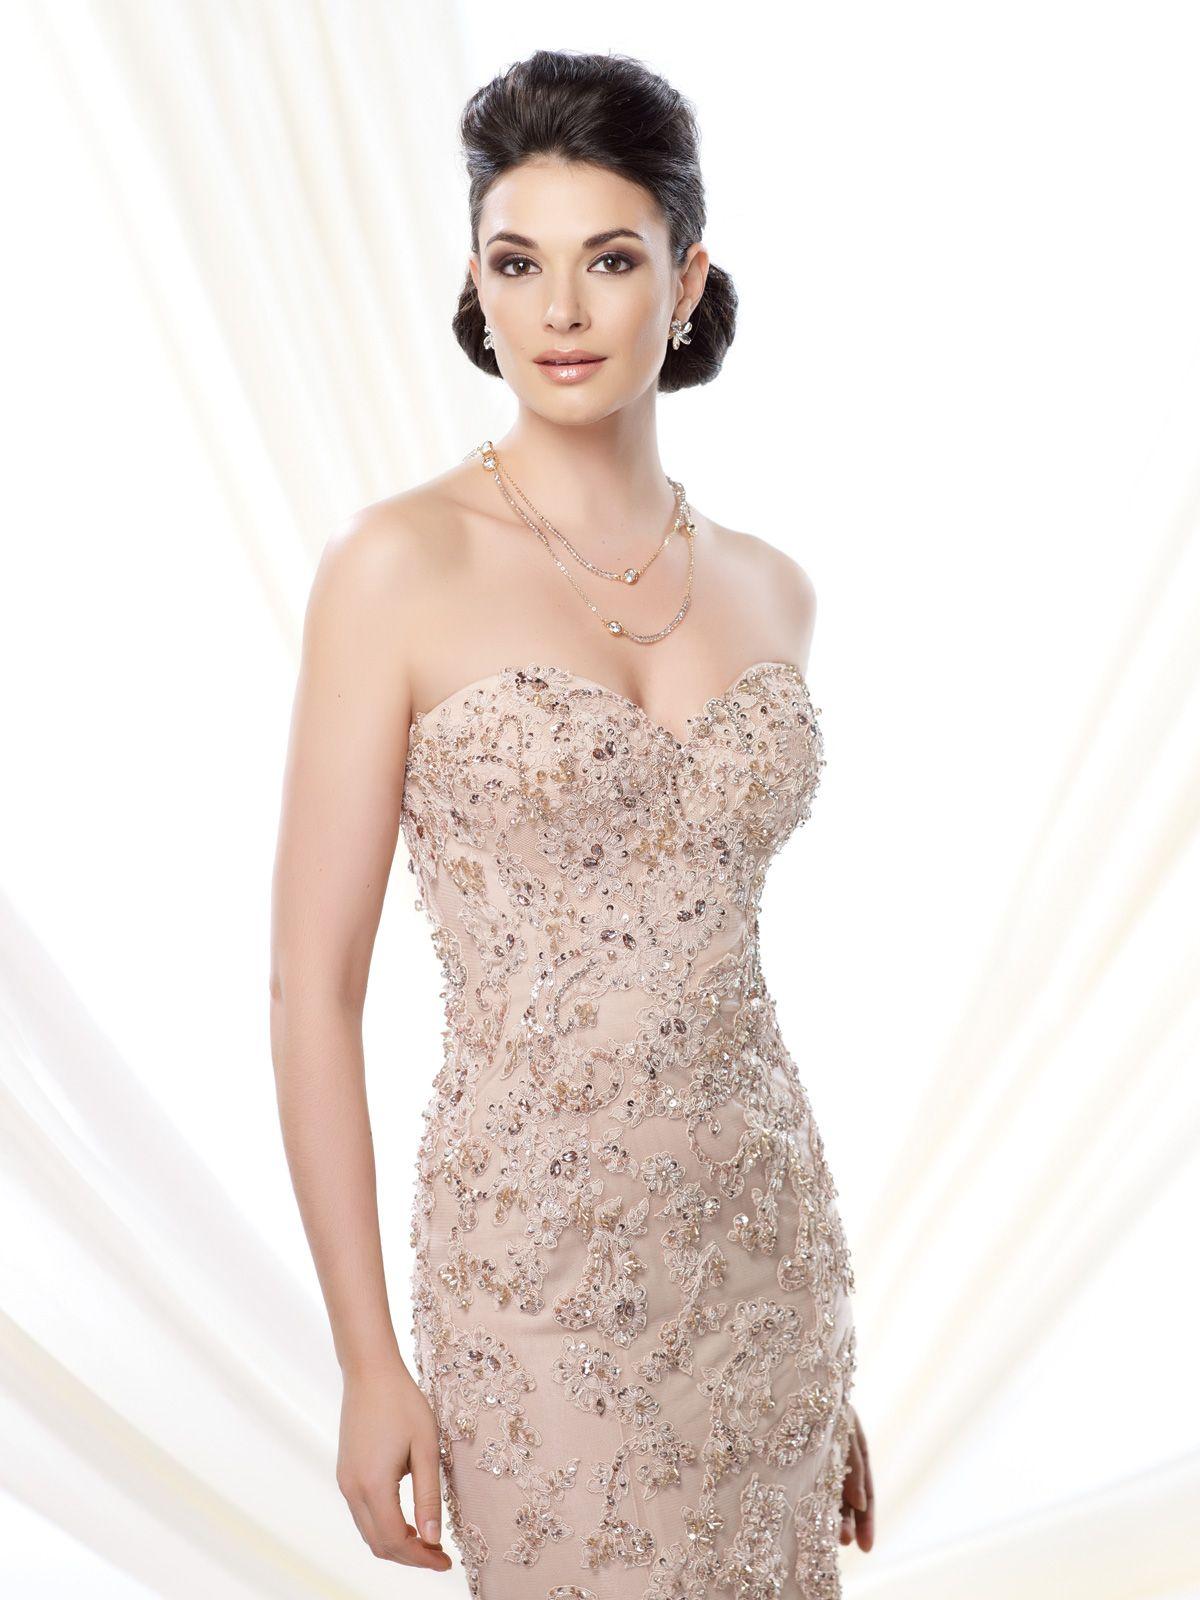 Ivonne d evening dresses d mermaid gown david tutera and